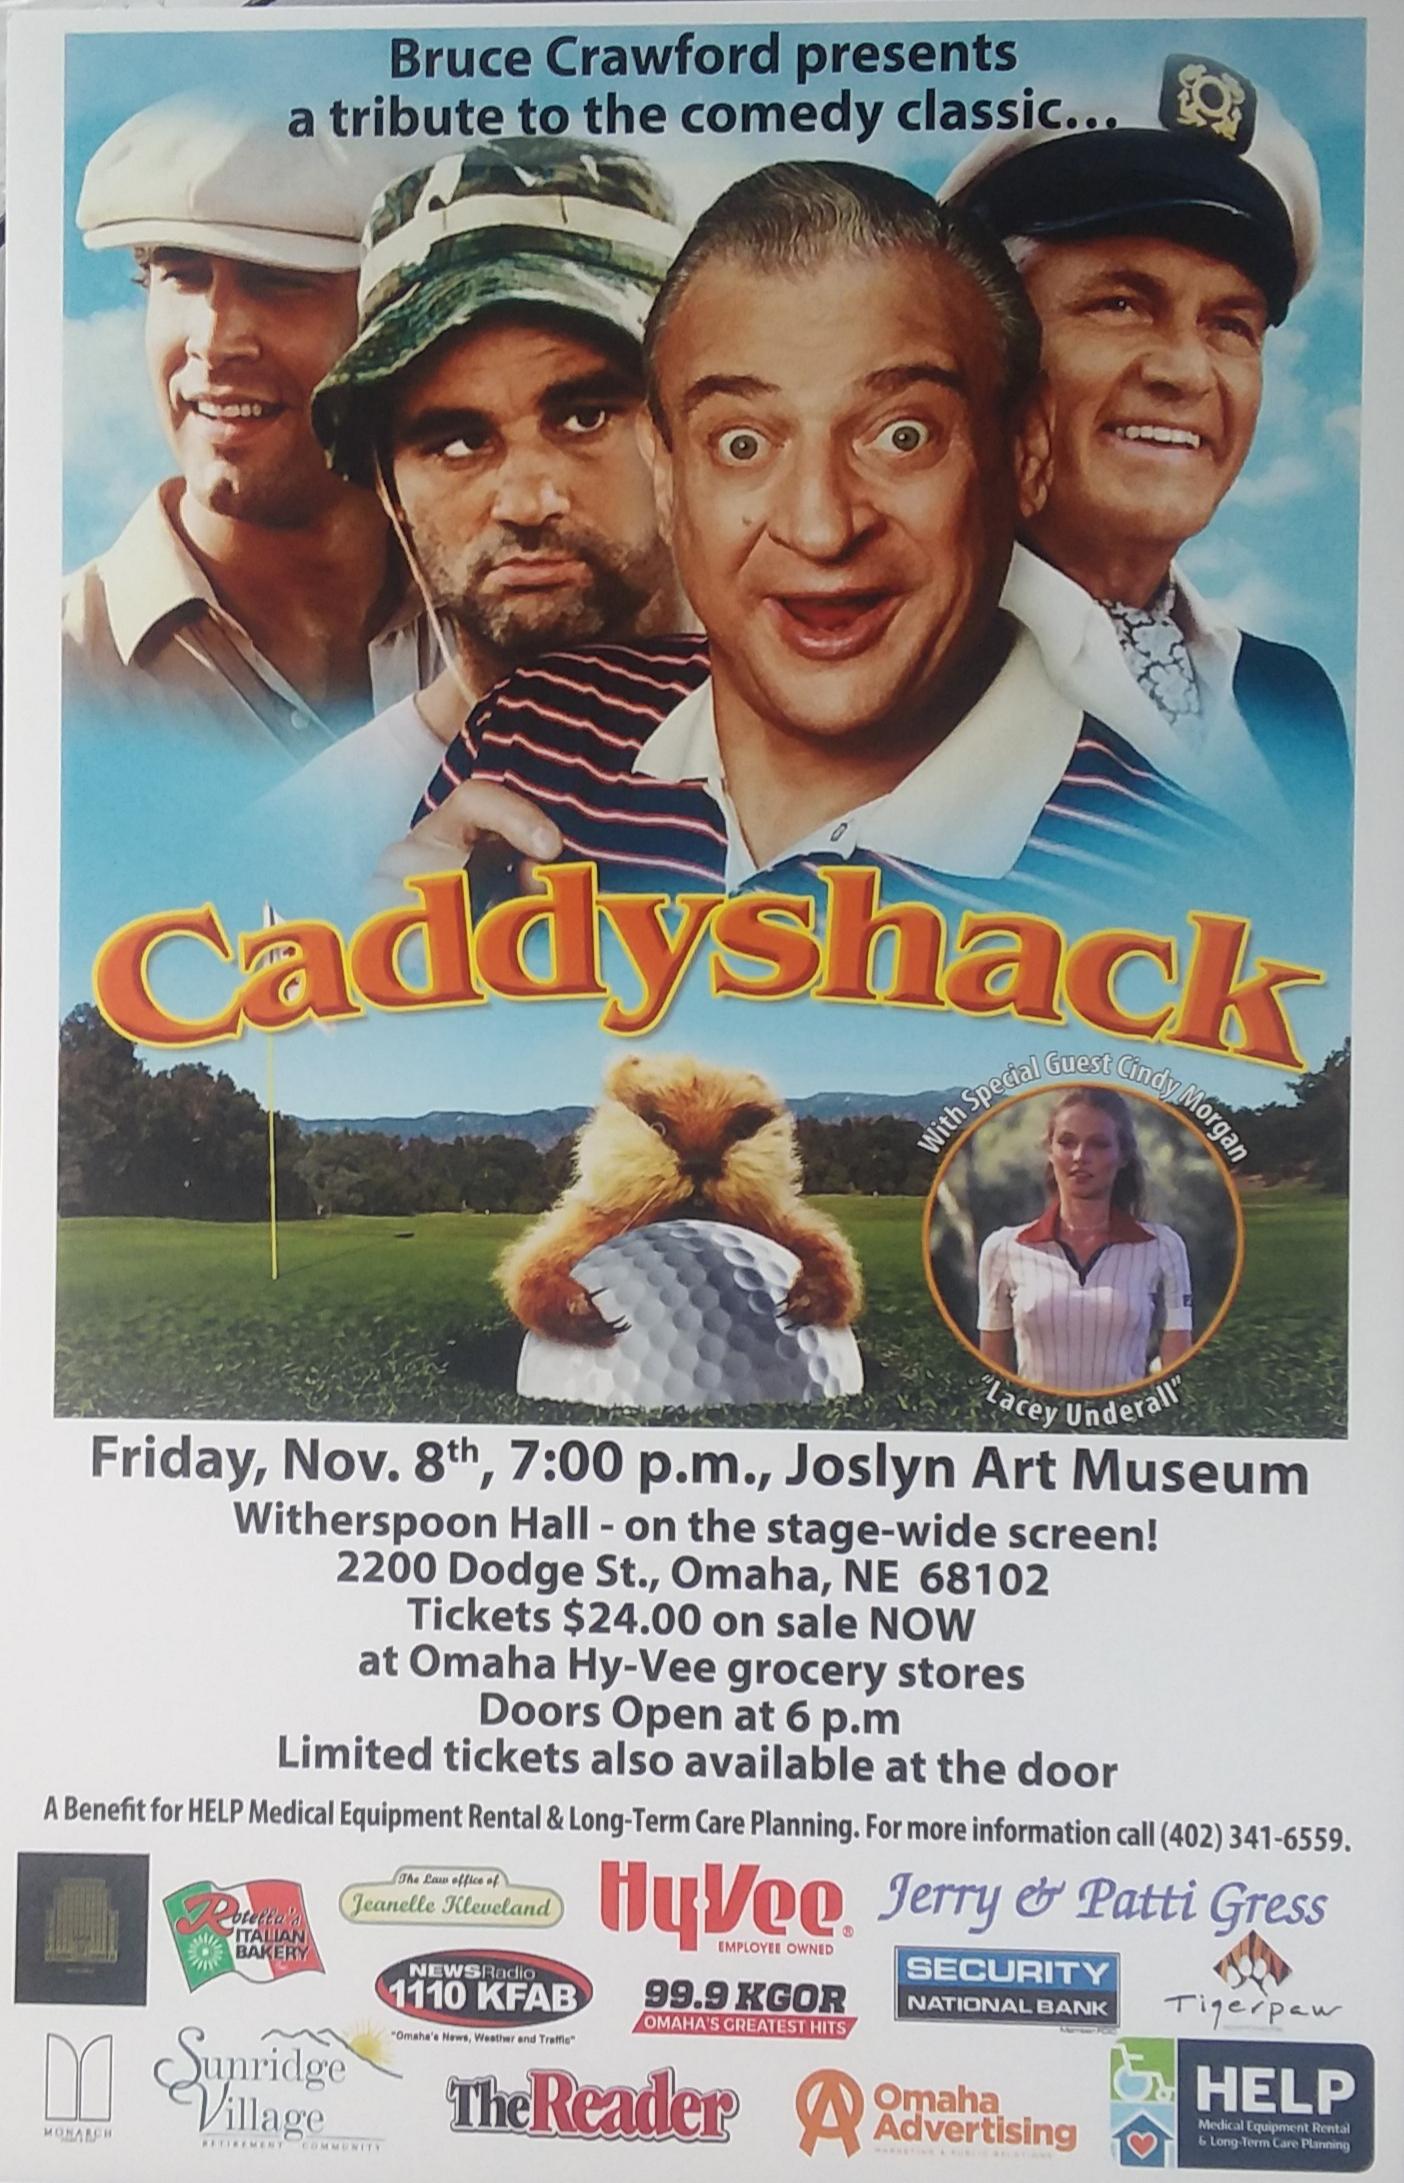 CADDYSHACK-Movie Event